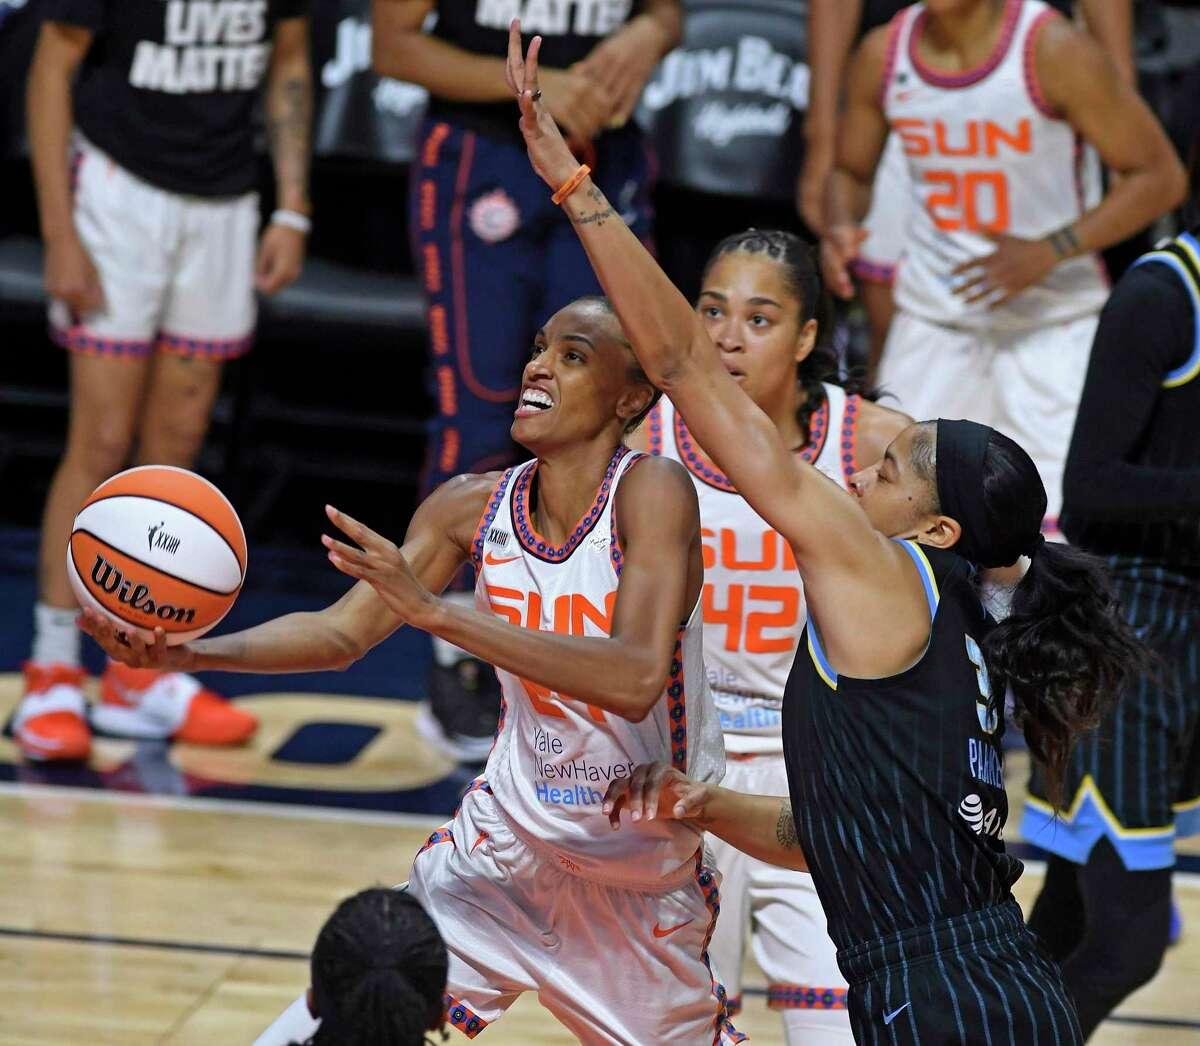 Connecticut Sun forward DeWanna Bonner, left, drives past the defense of Chicago Sky forward Candace Parker during a WNBA basketball game Sunday, June 27, 2021, in Uncasville, Conn. (Sean D. Elliot/The Day via AP)